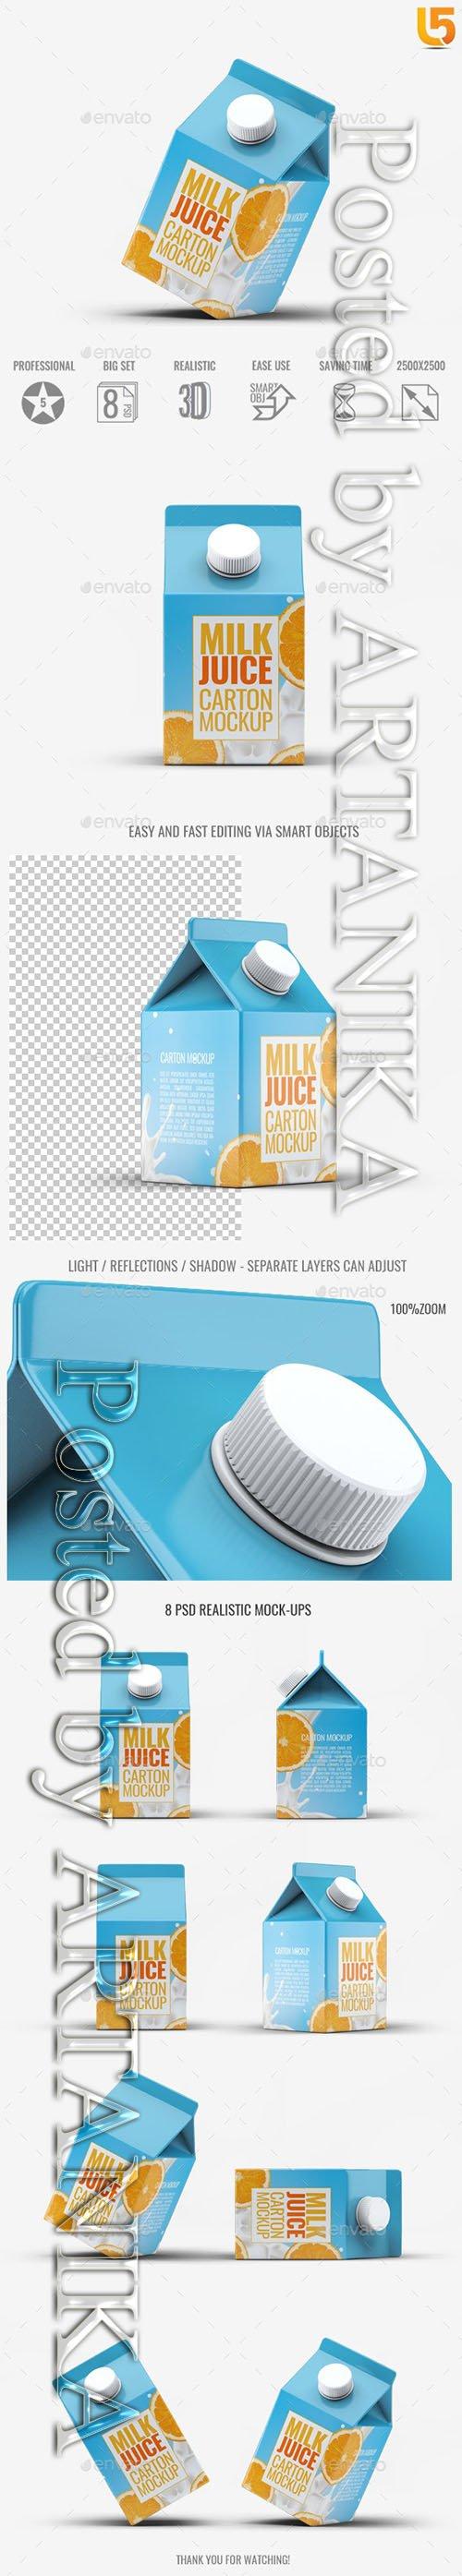 Milk or Juice Carton Mock-Up v4 21791464